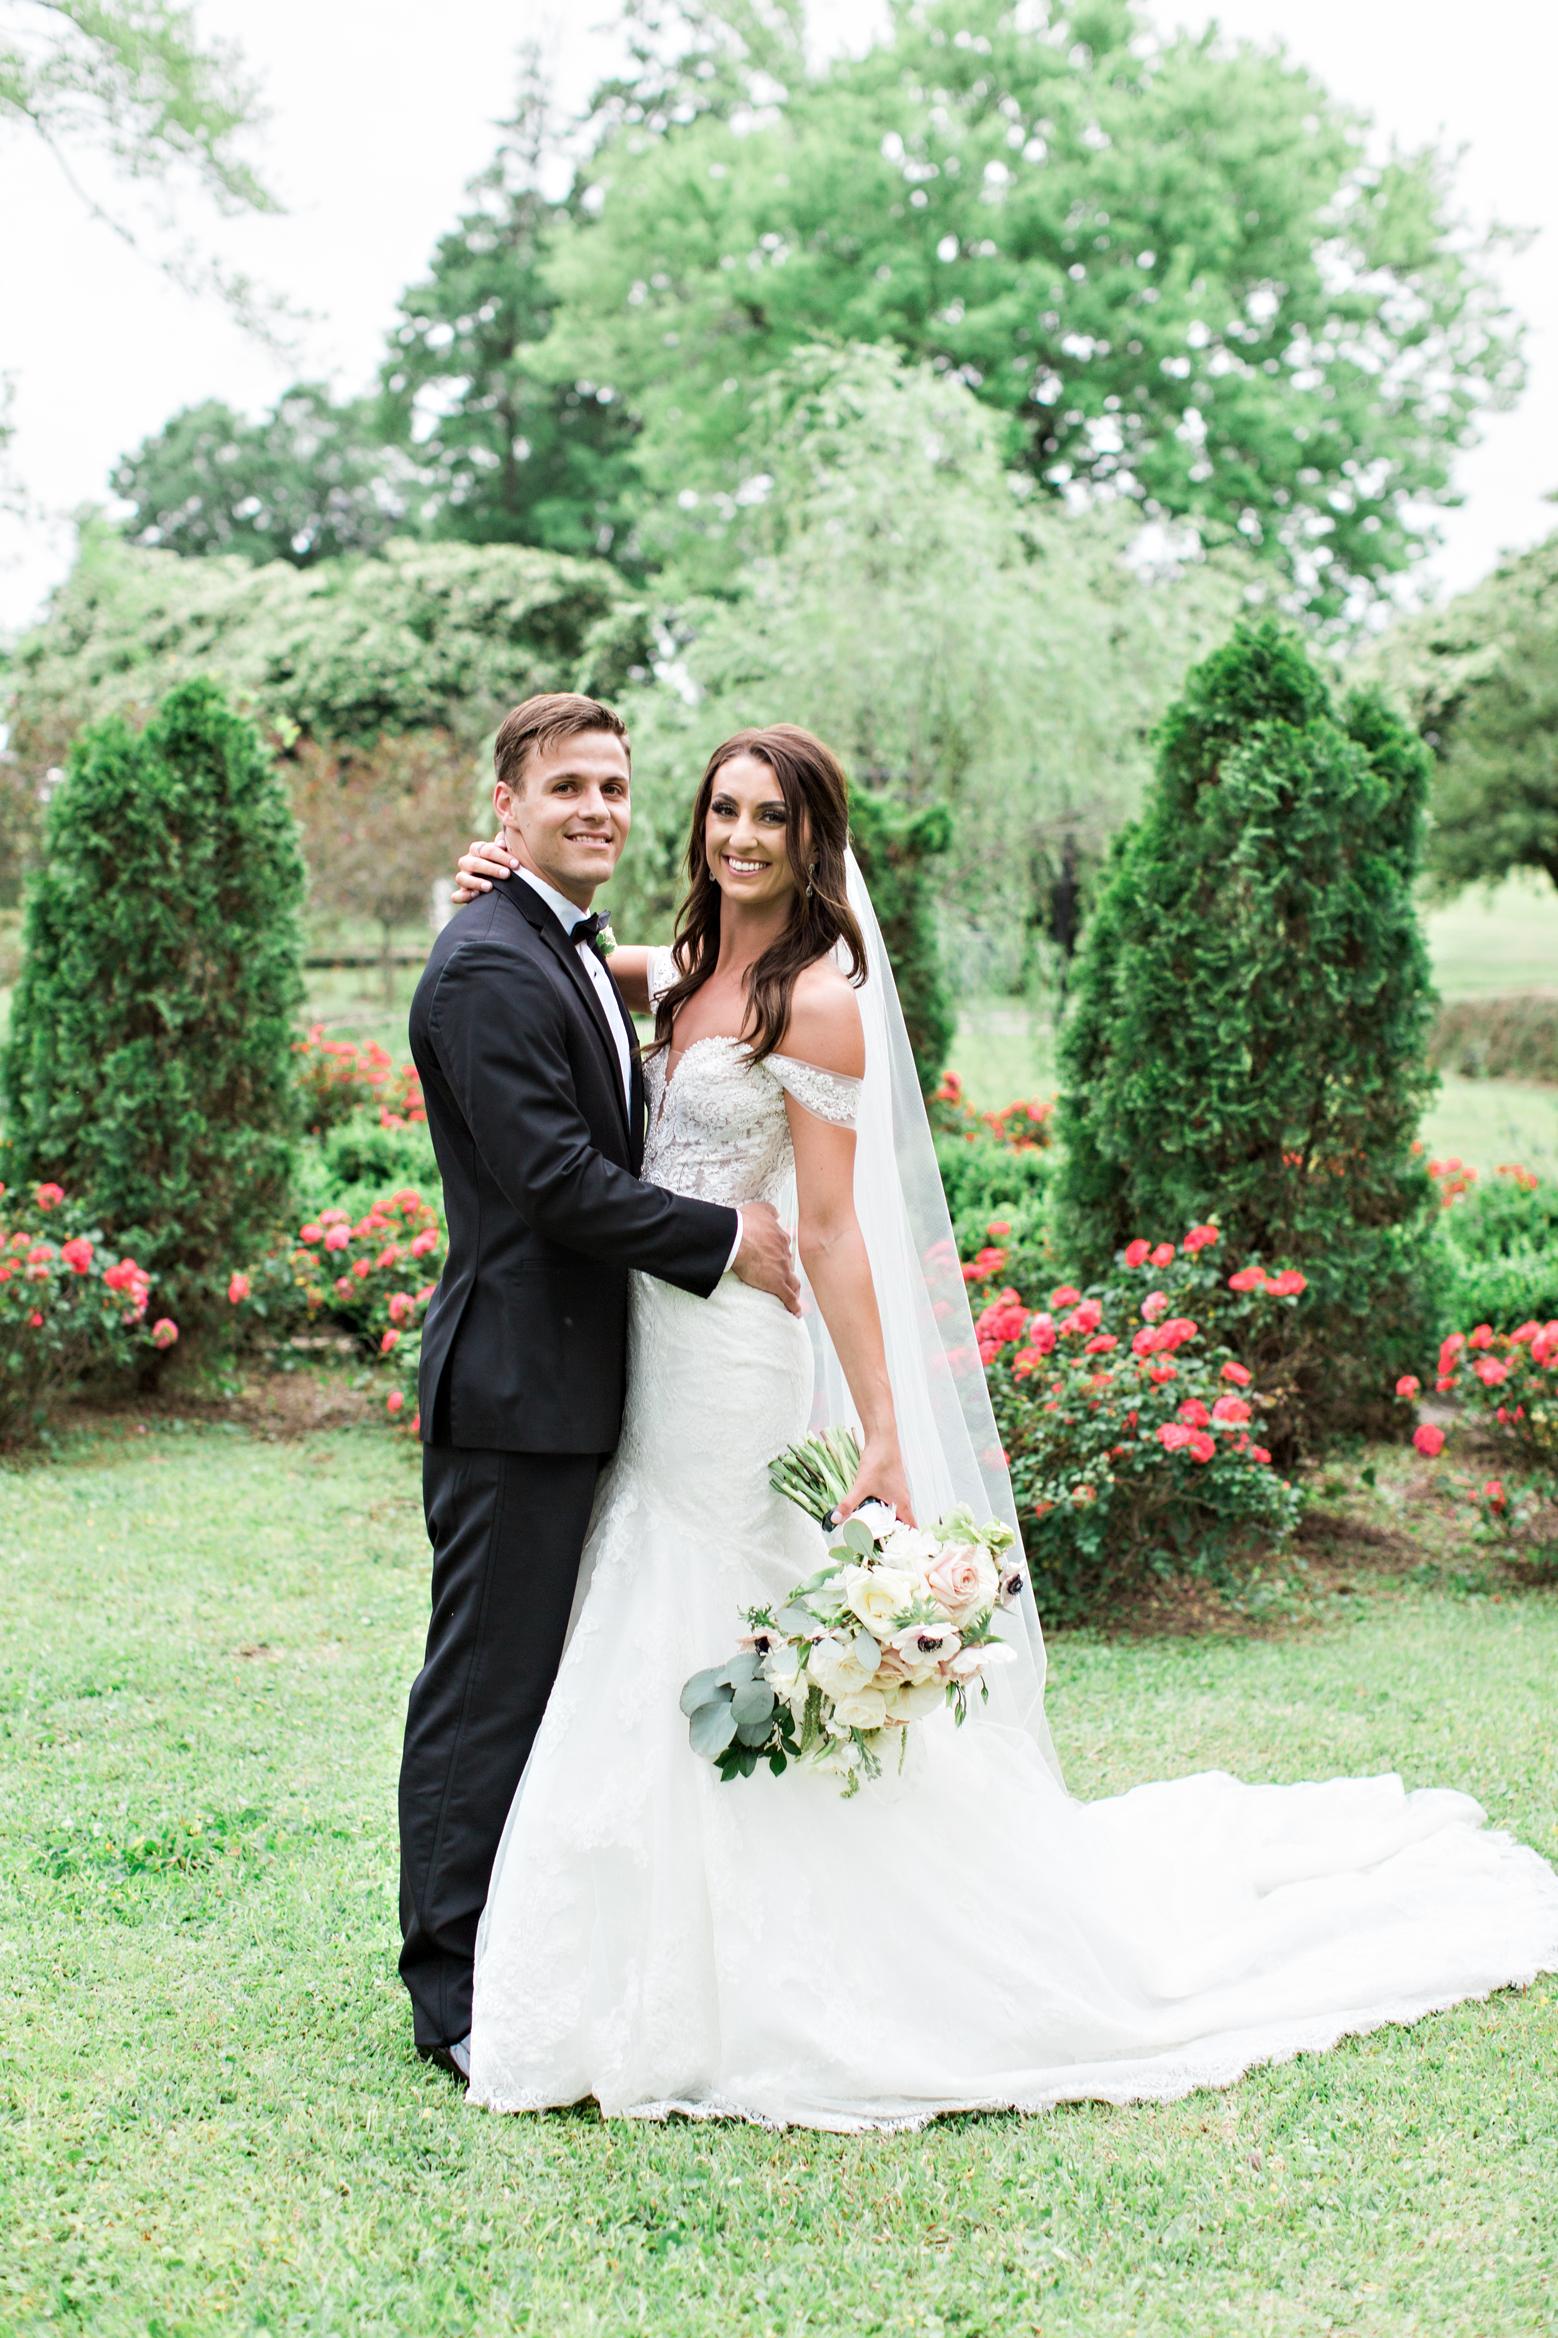 Matty-Drollette-Montgomery-Alabama-Wedding-Photography-155.jpg